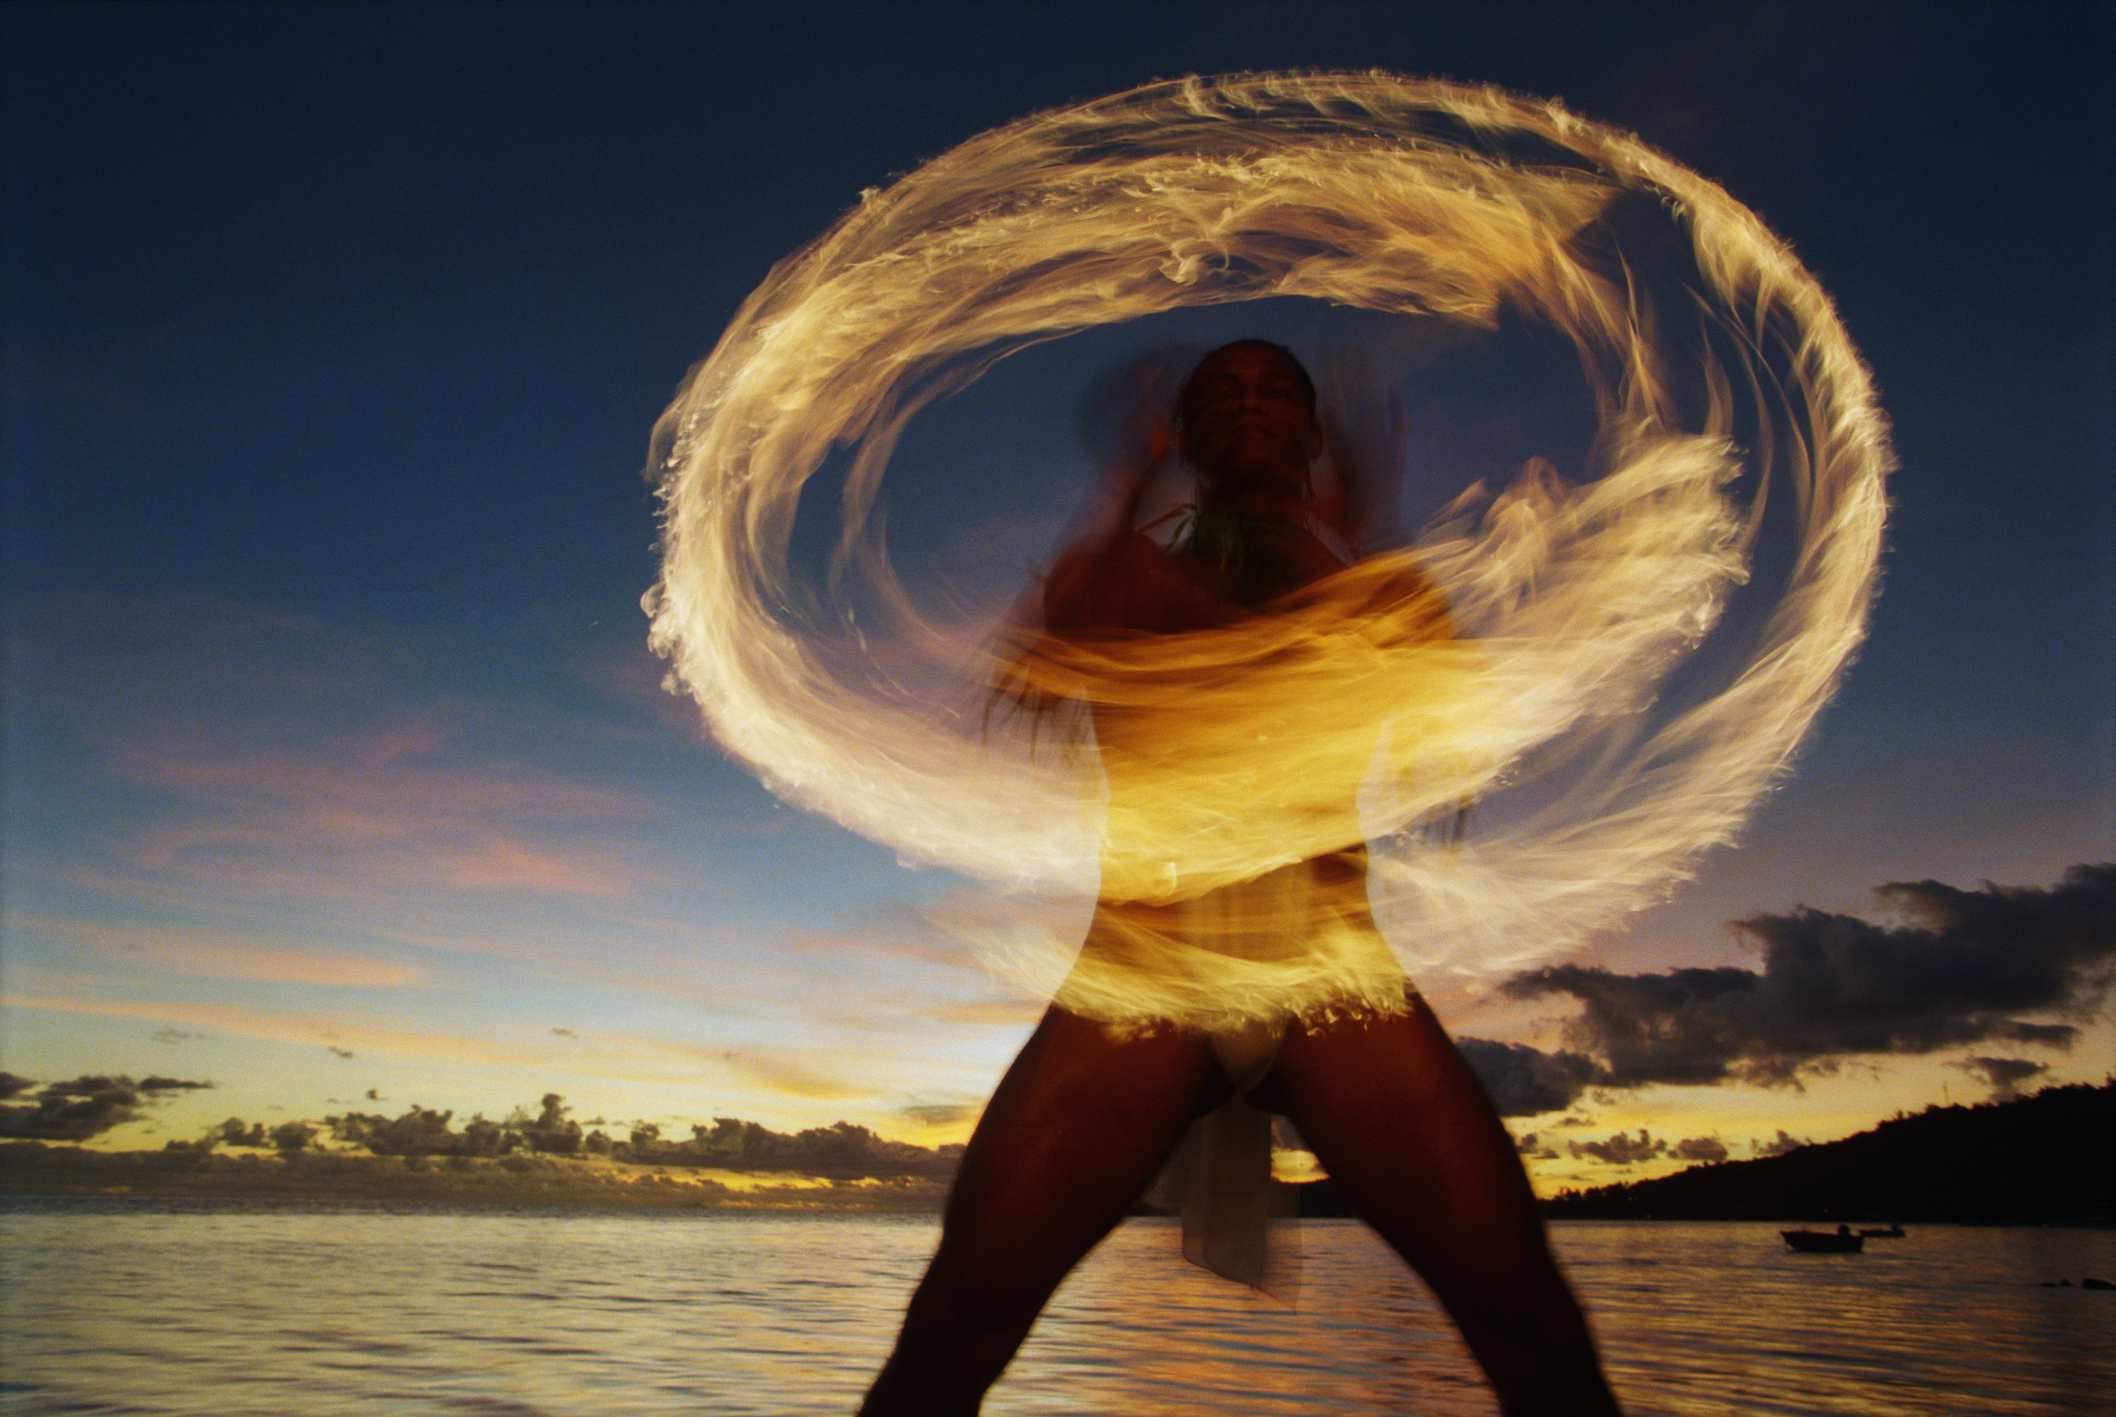 Traditional Tahitian fire dancer performing